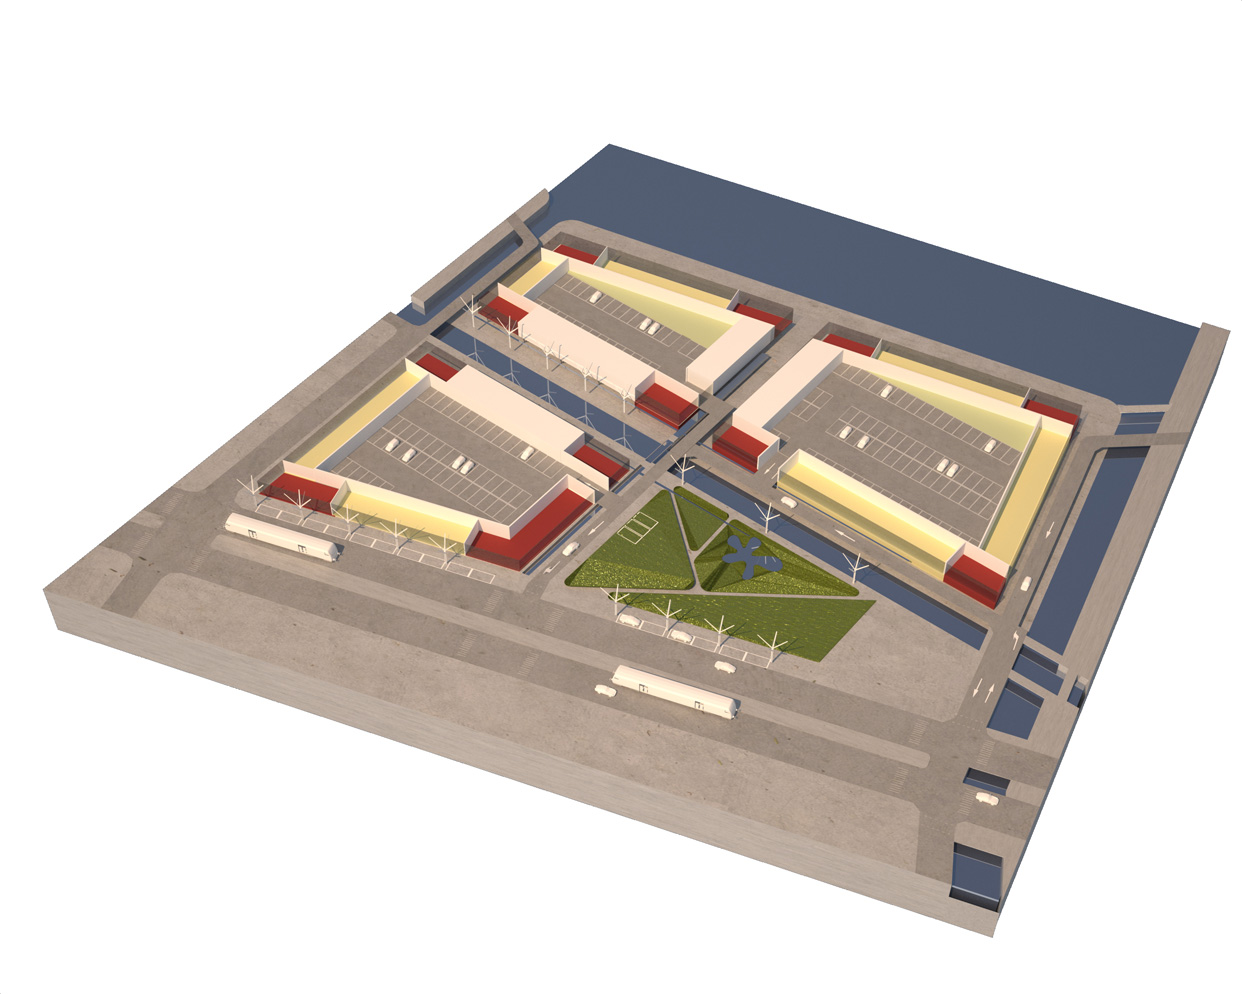 Jonkoping_Munksjon_Skeppsbrokajen_Bostader_Stadsbyggnad_Stadsplanering_Tavling_Typkvarter3_Varg_Arkitekter